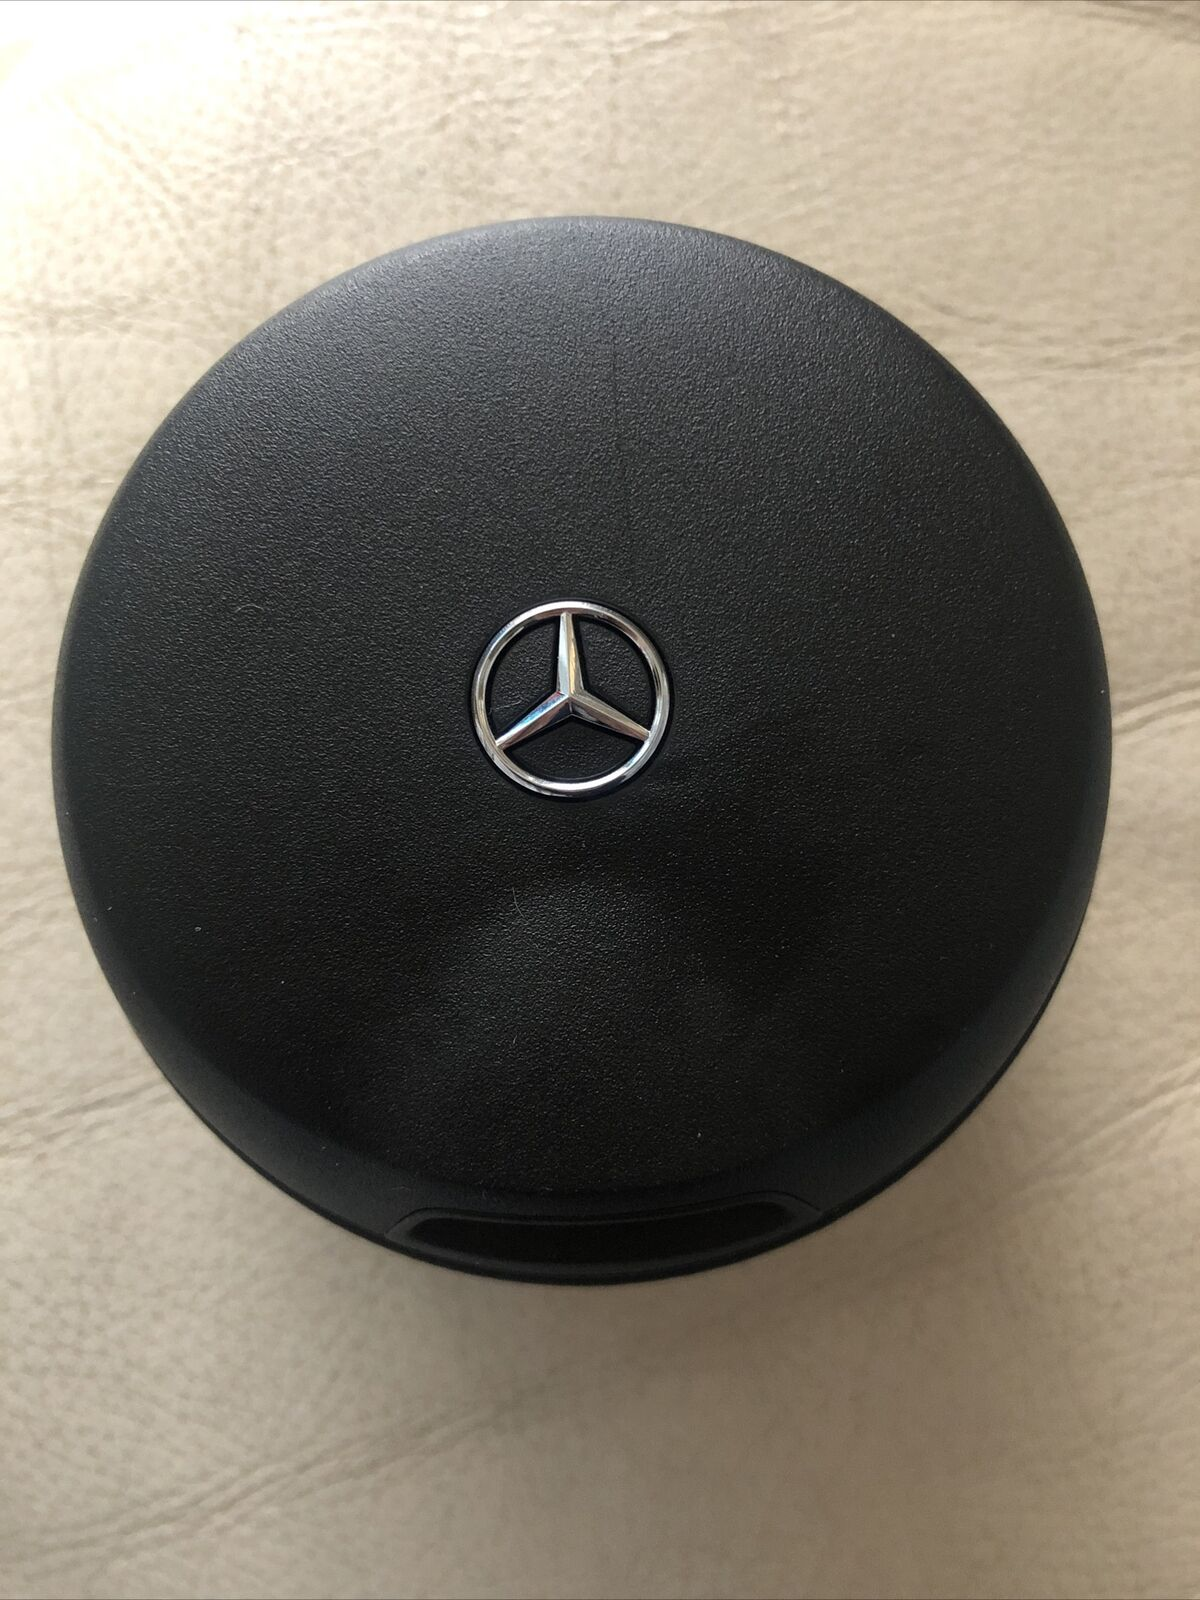 uxcell a13052200ux1199 Automotive ashtrays